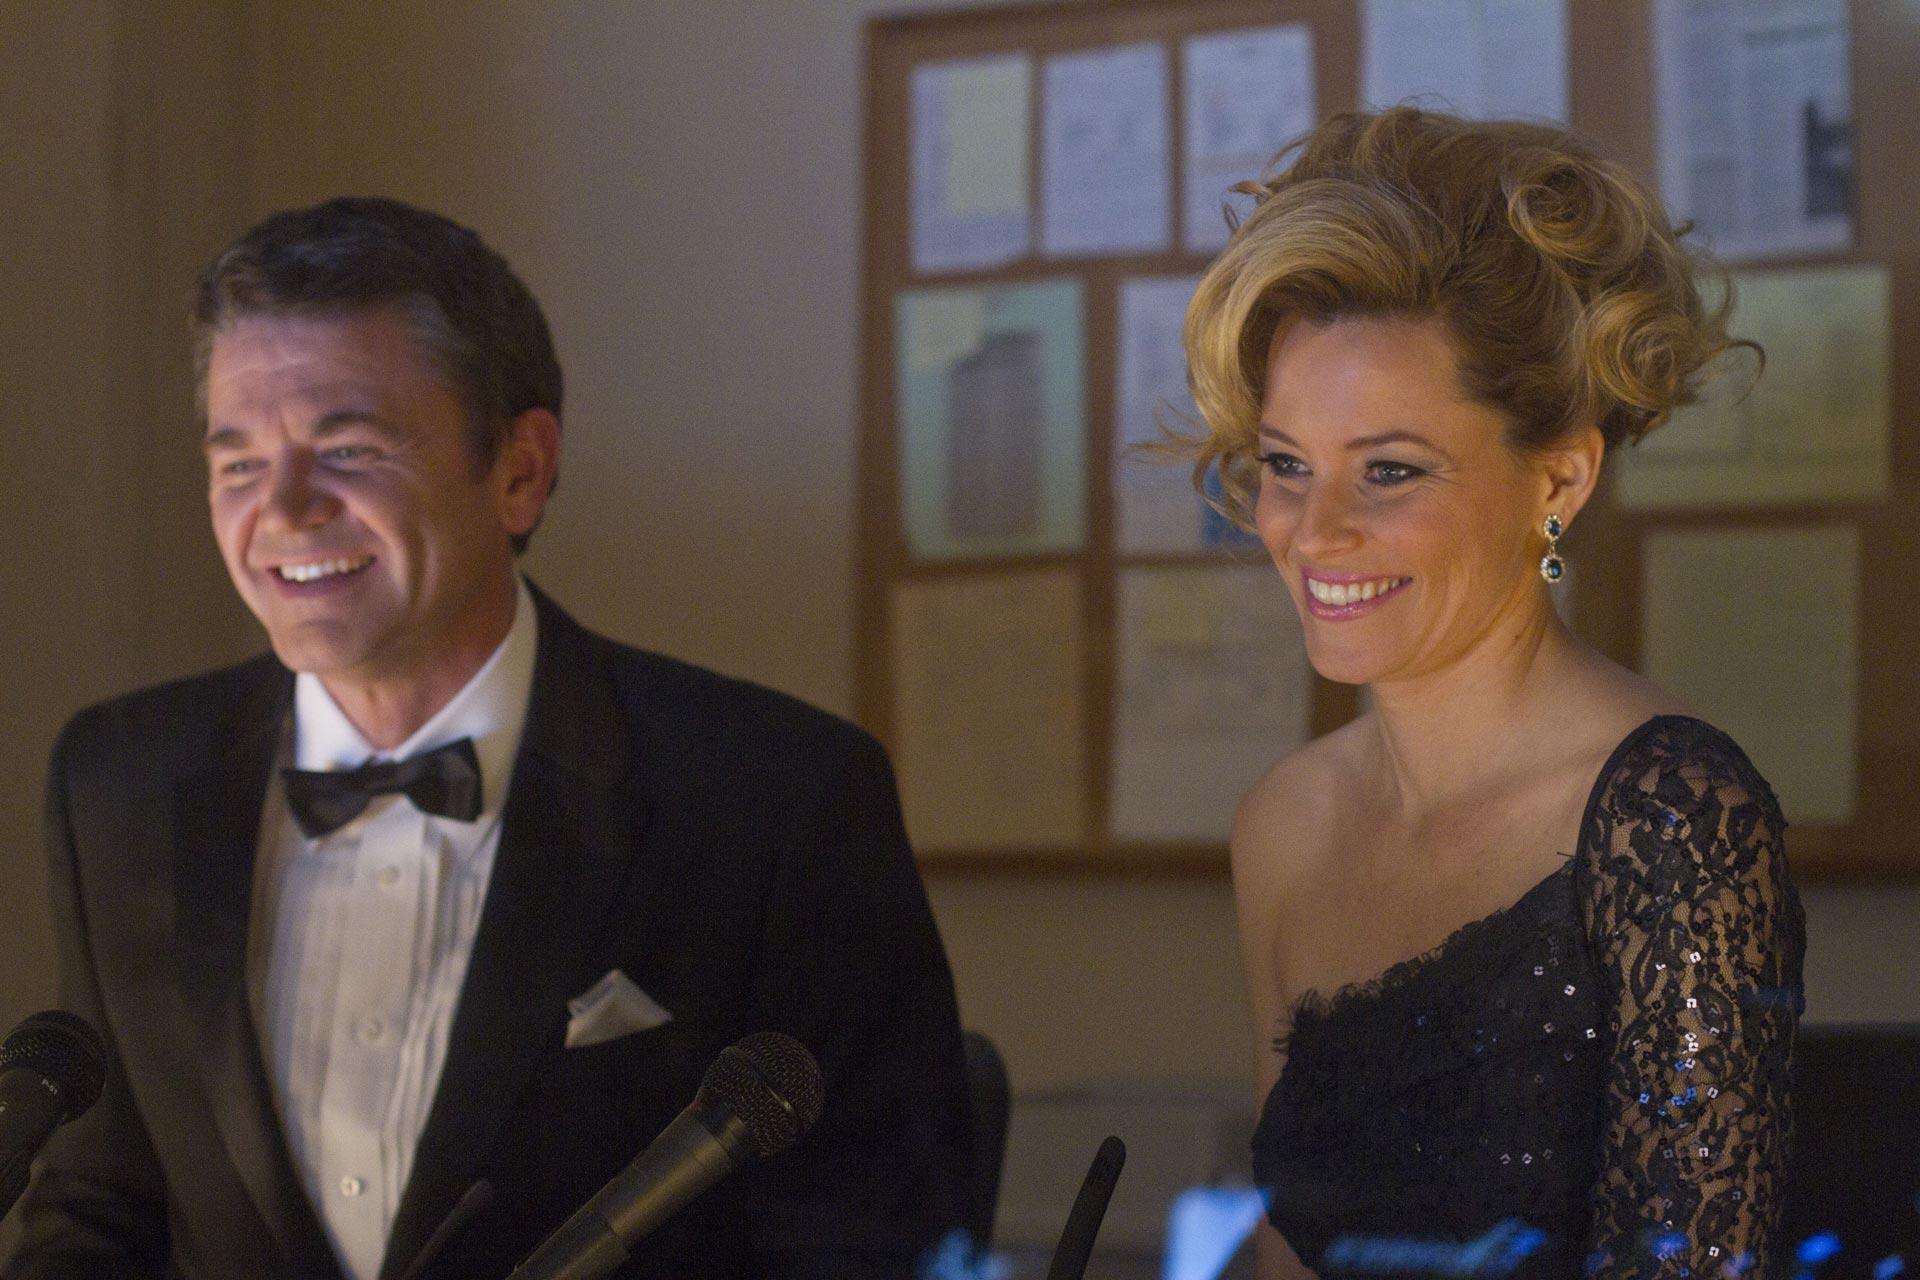 https://i0.wp.com/www.filmofilia.com/wp-content/uploads/2012/06/Pitch-Perfect-img-03.jpg